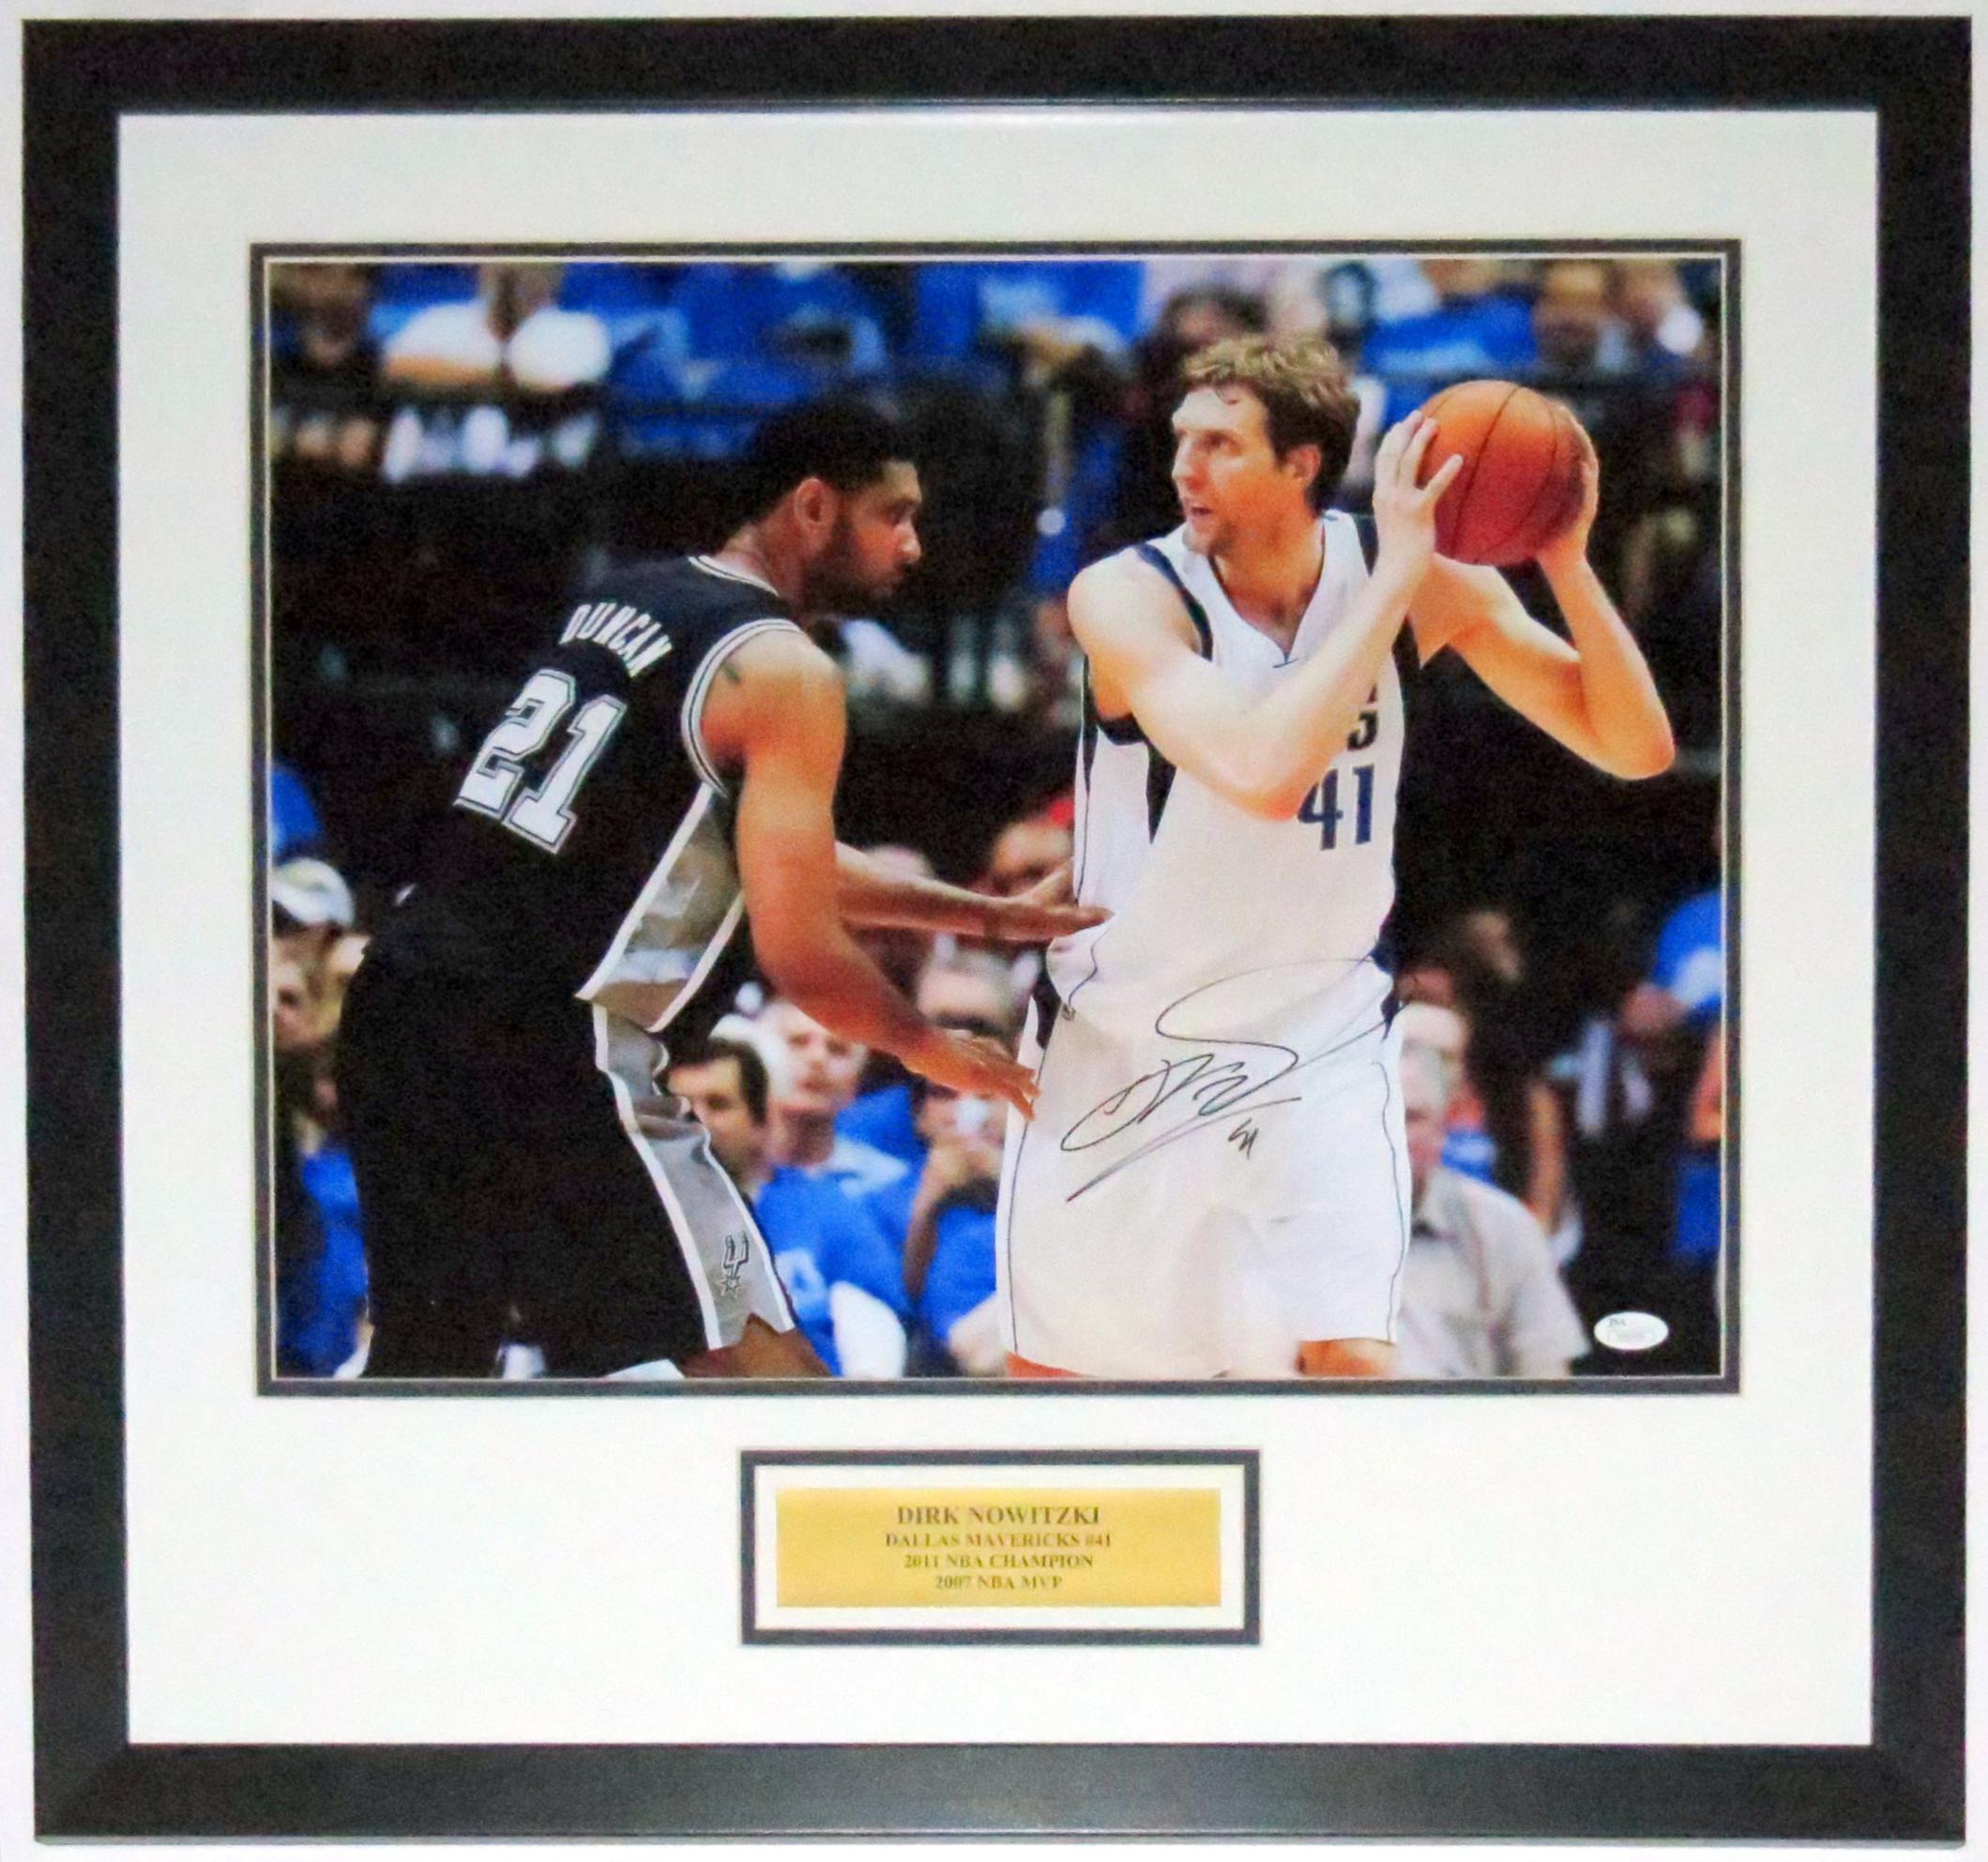 Dirk Nowitzki Signed Dallas Mavericks 16x20 Photo - JSA COA Authenticated - Professionally Framed & Plate